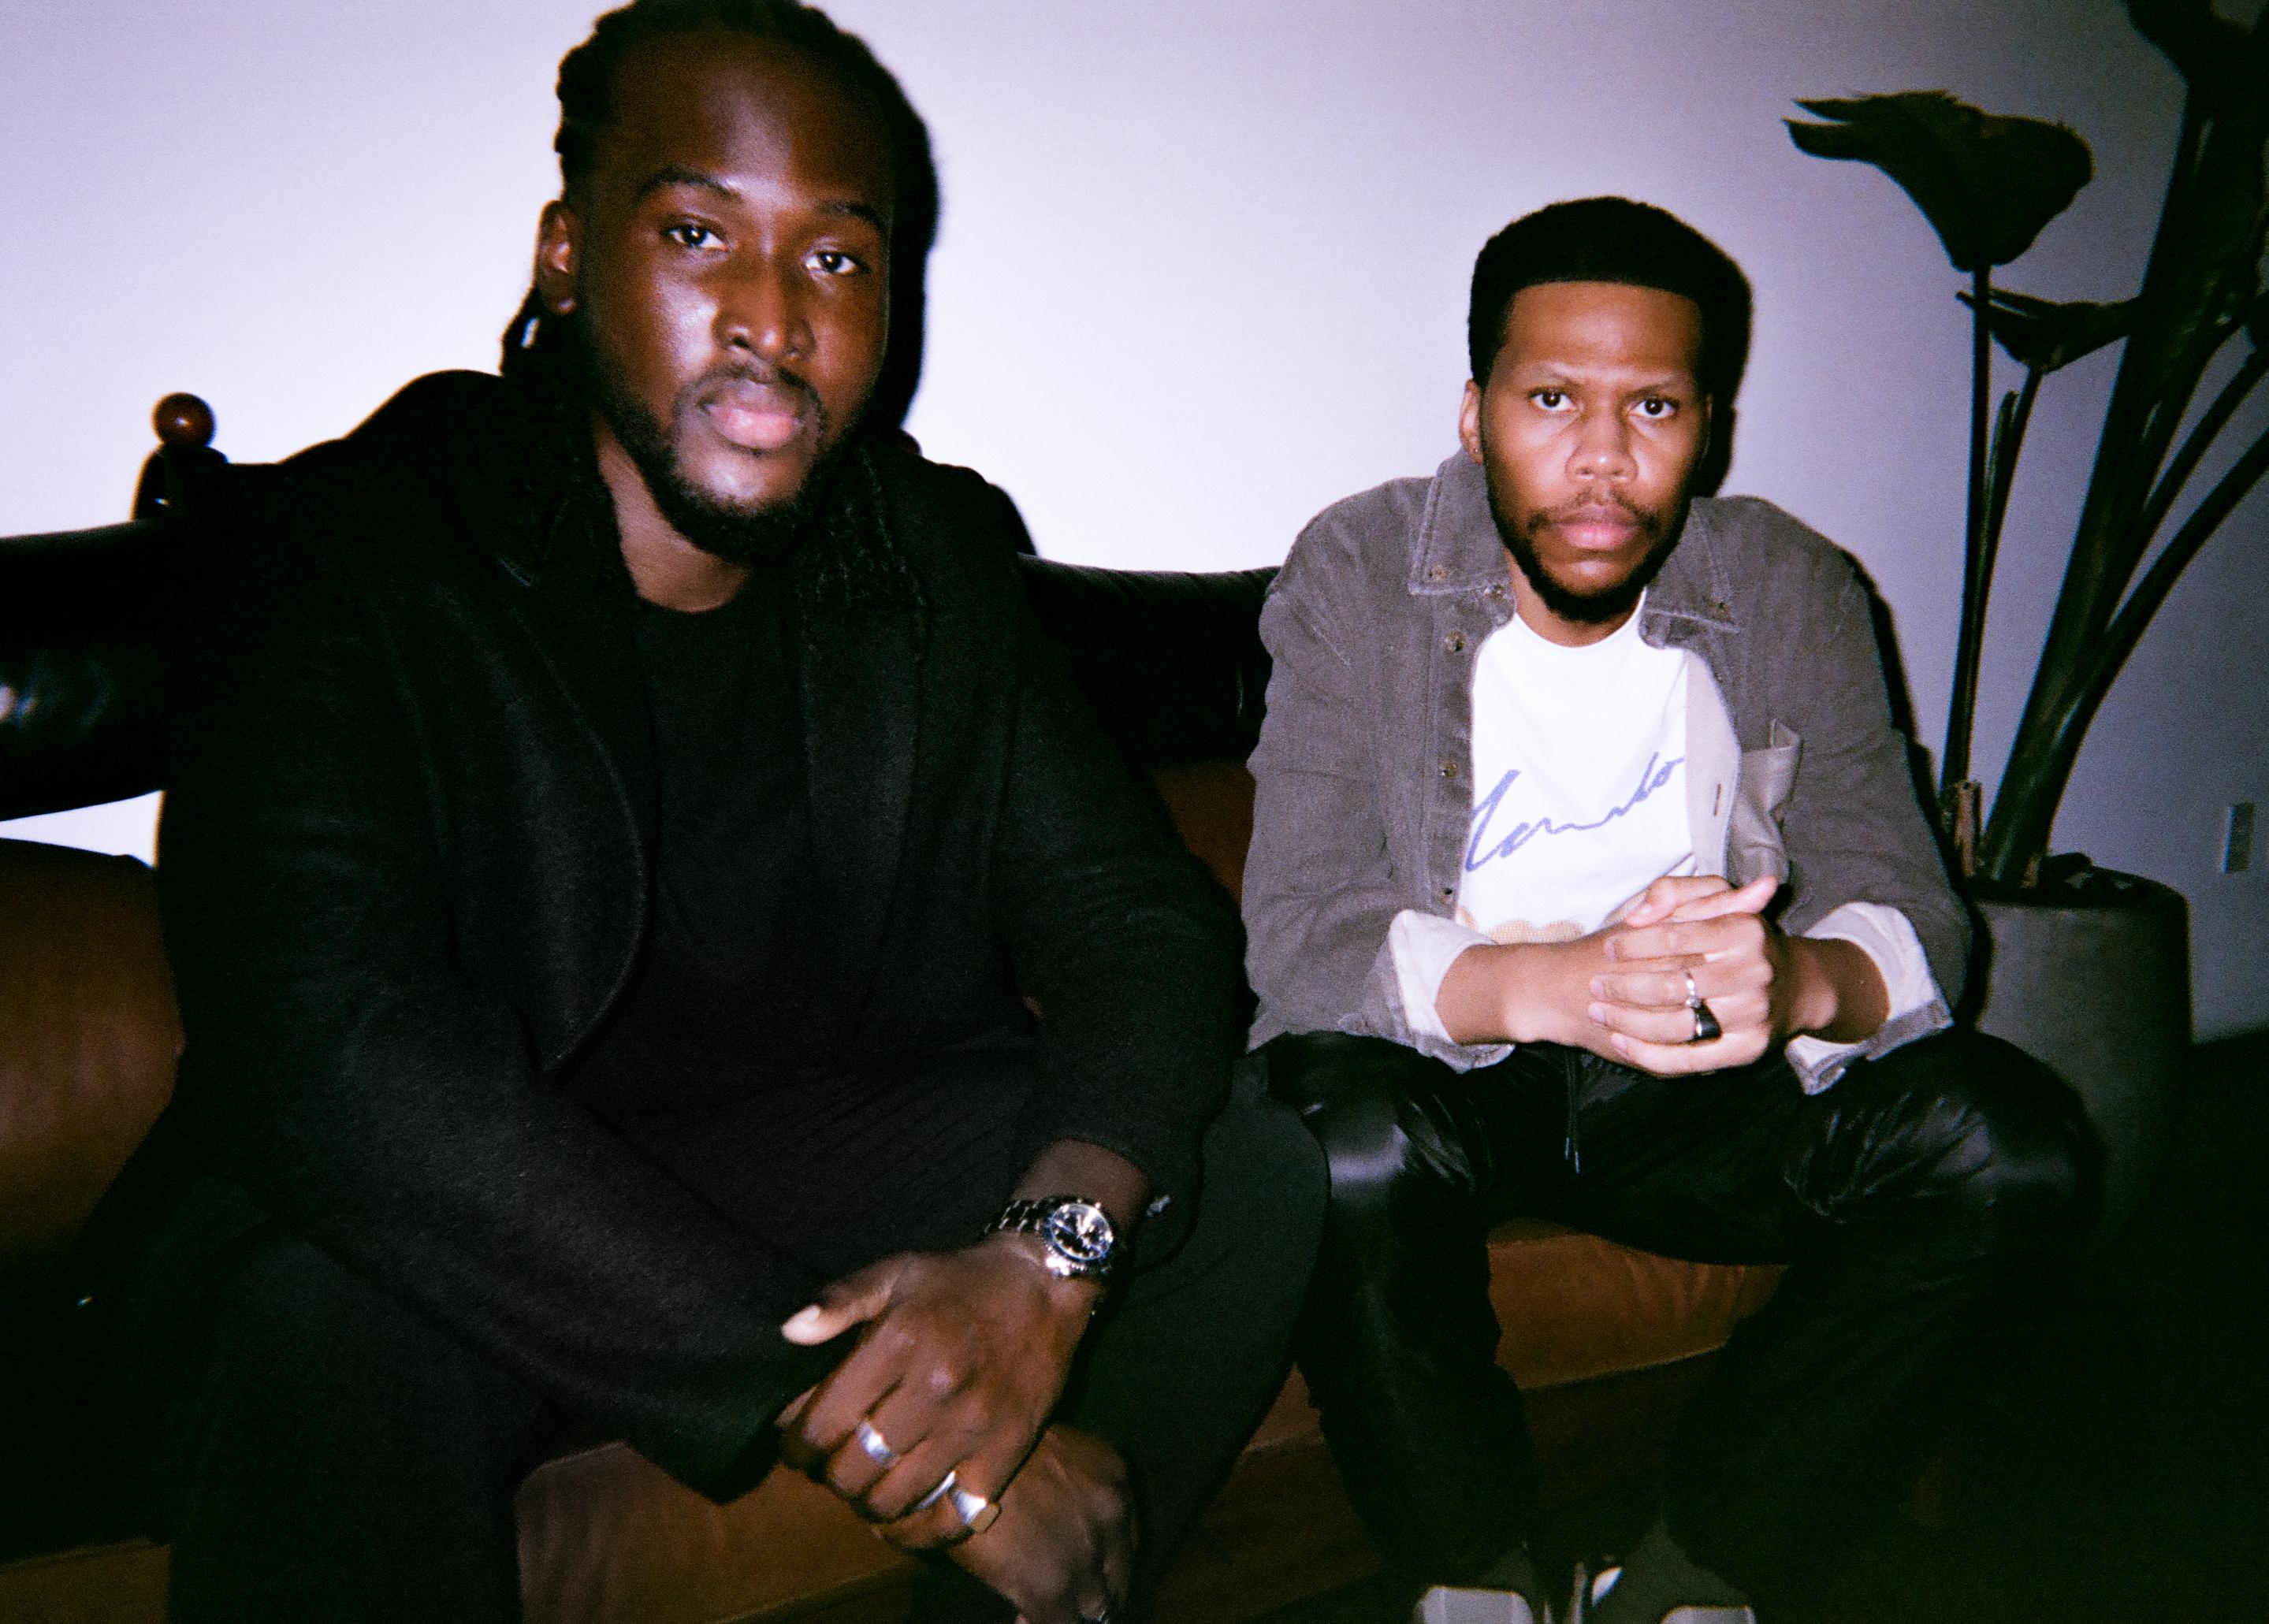 Blacktag founders Ousman Sahko and Akin Adebowale